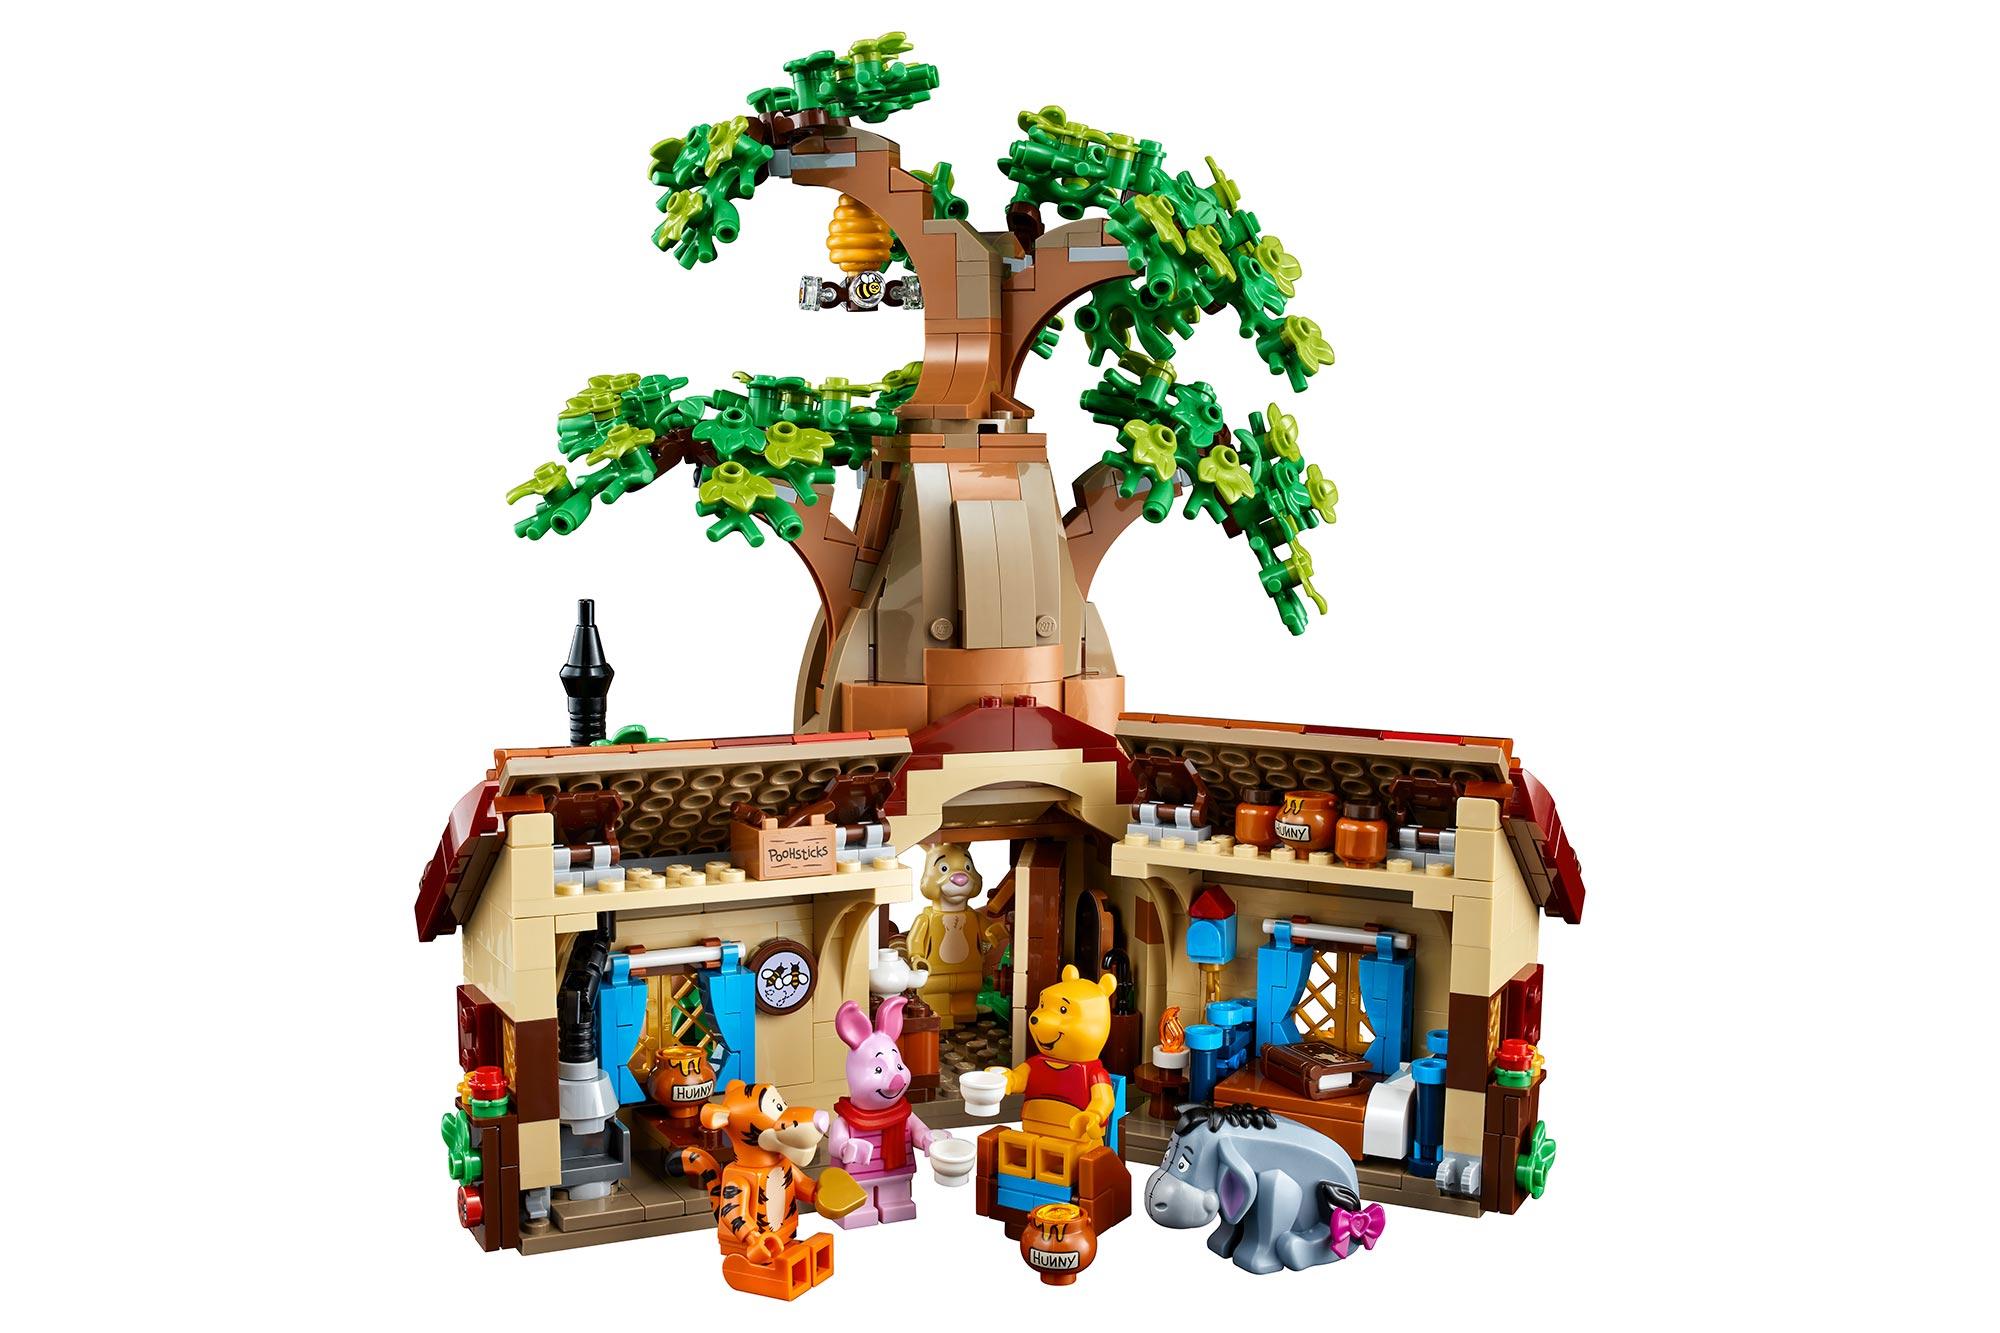 Winnie the Pooh LEGO set opened up.